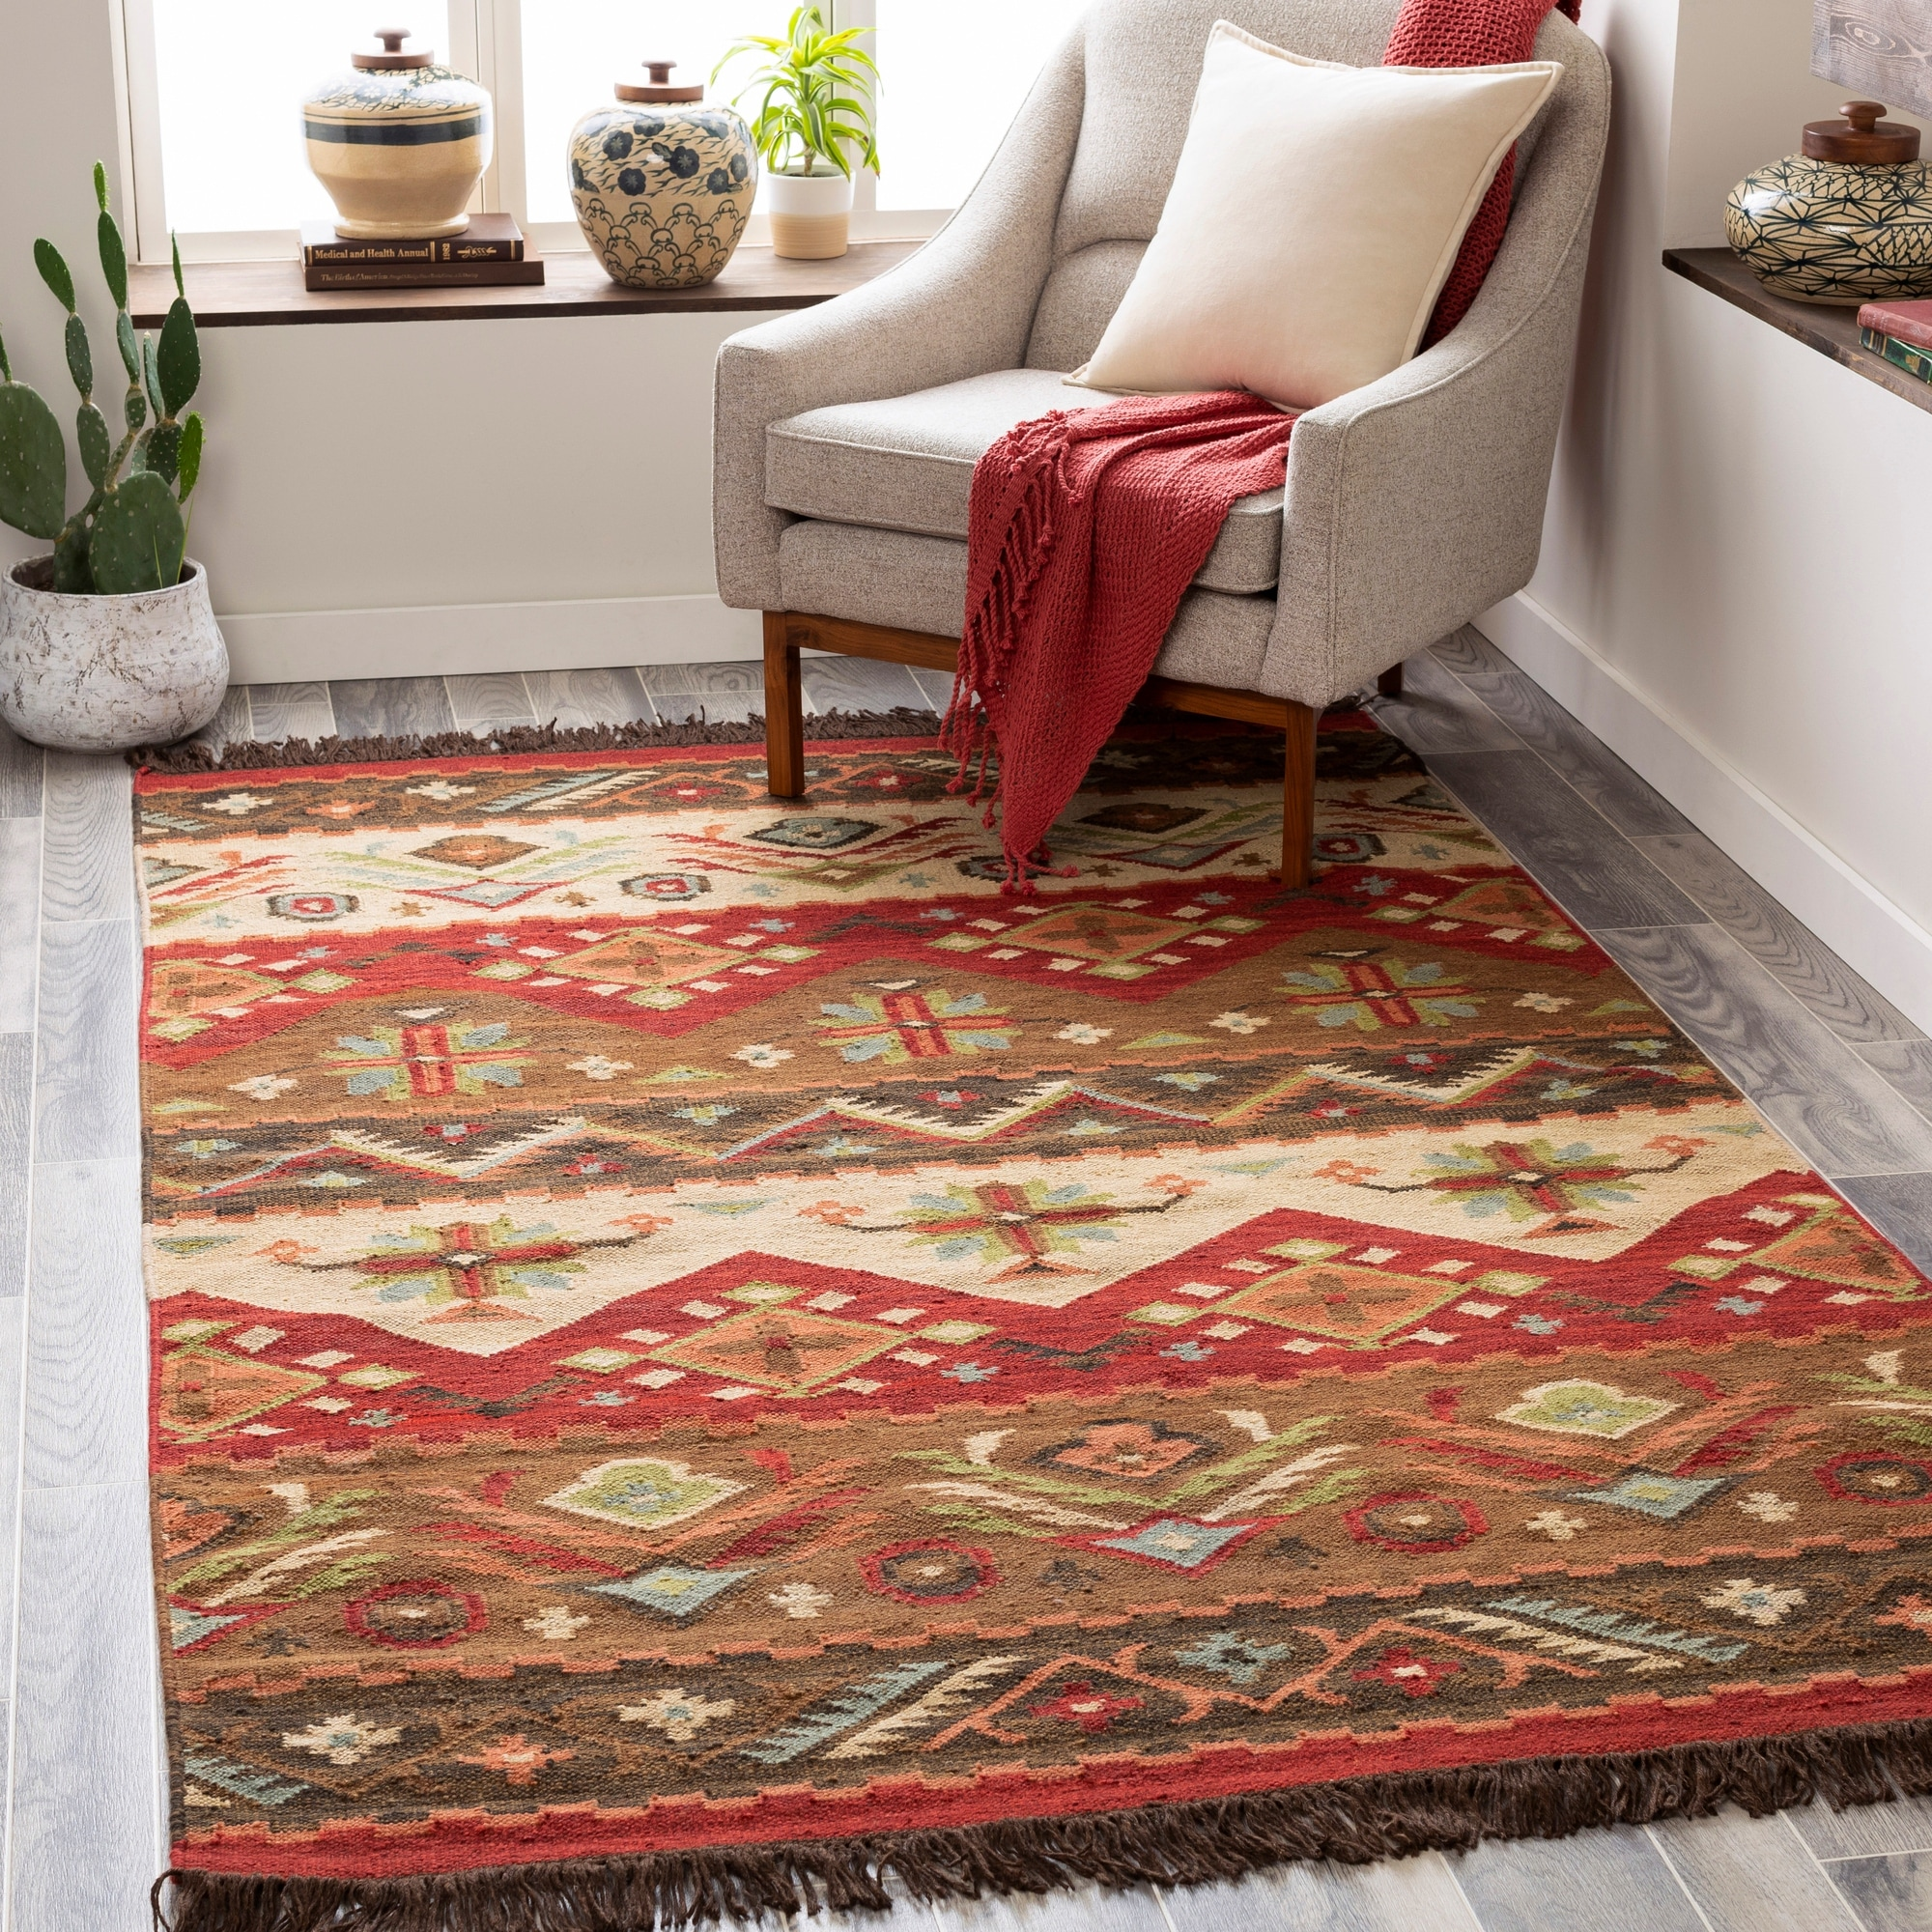 Hand Woven Southwestern Aztec Louise Wool Flatweave Area Rug Overstock 5995958